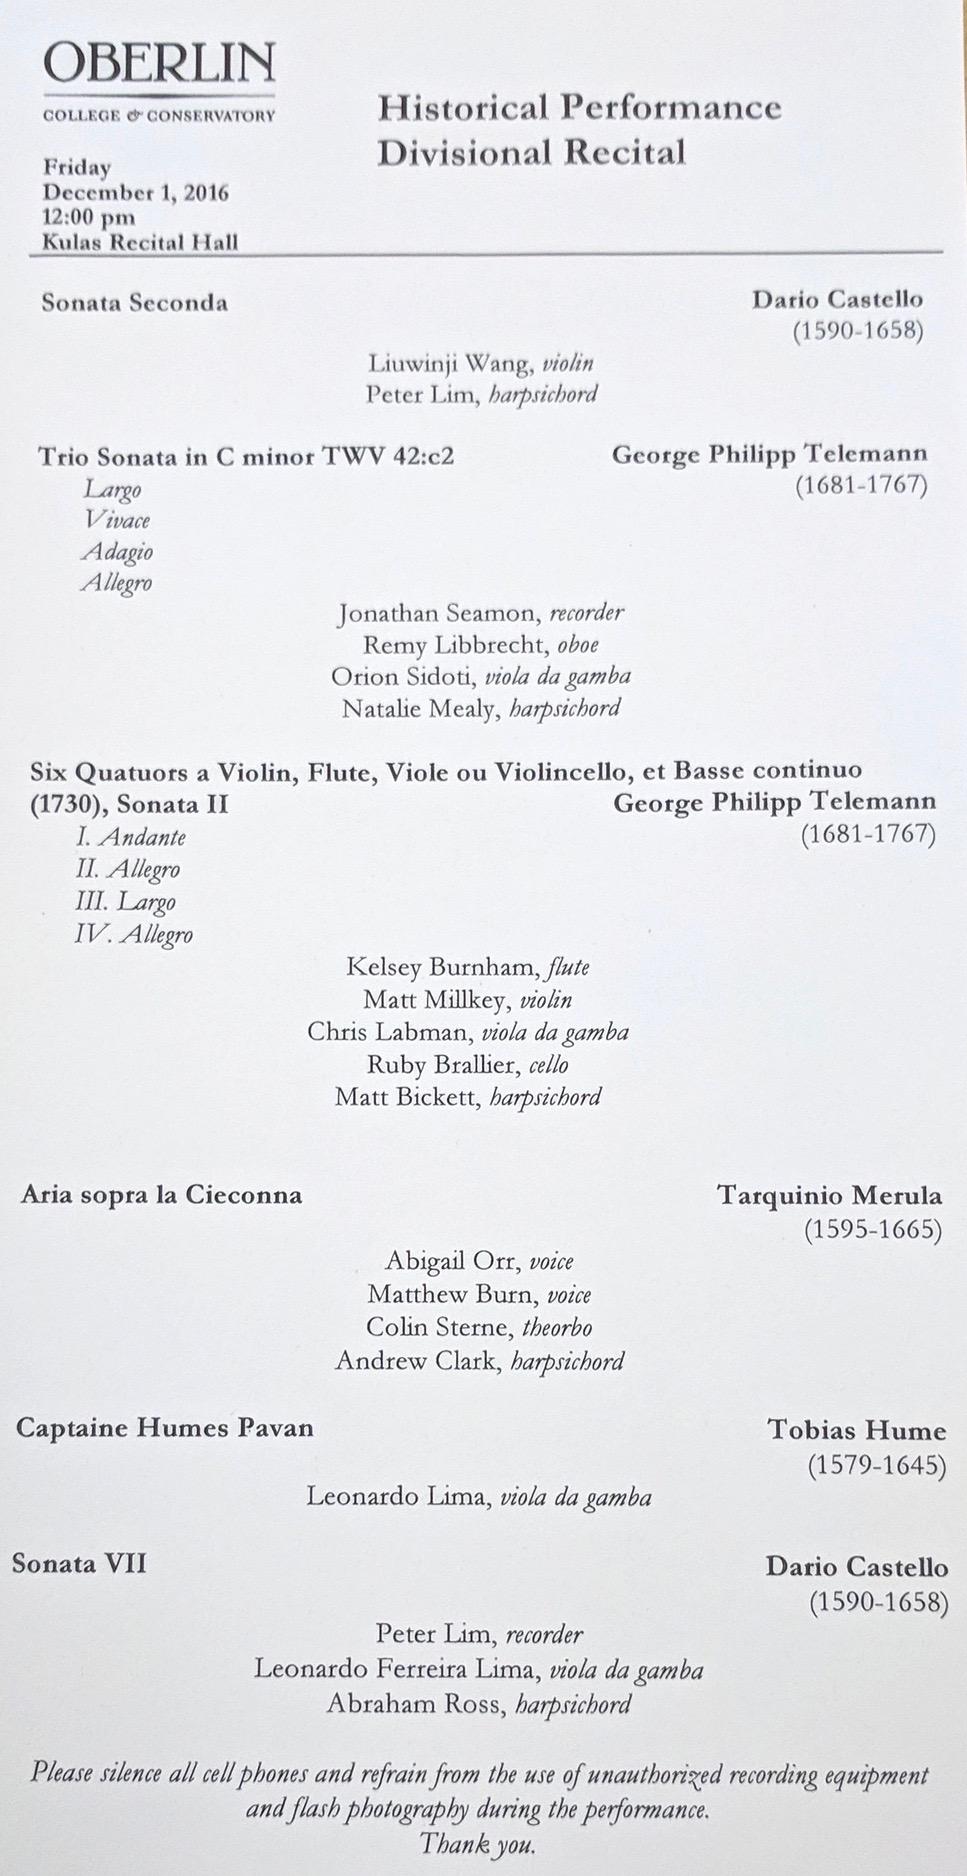 Collin played in the Merula aria.